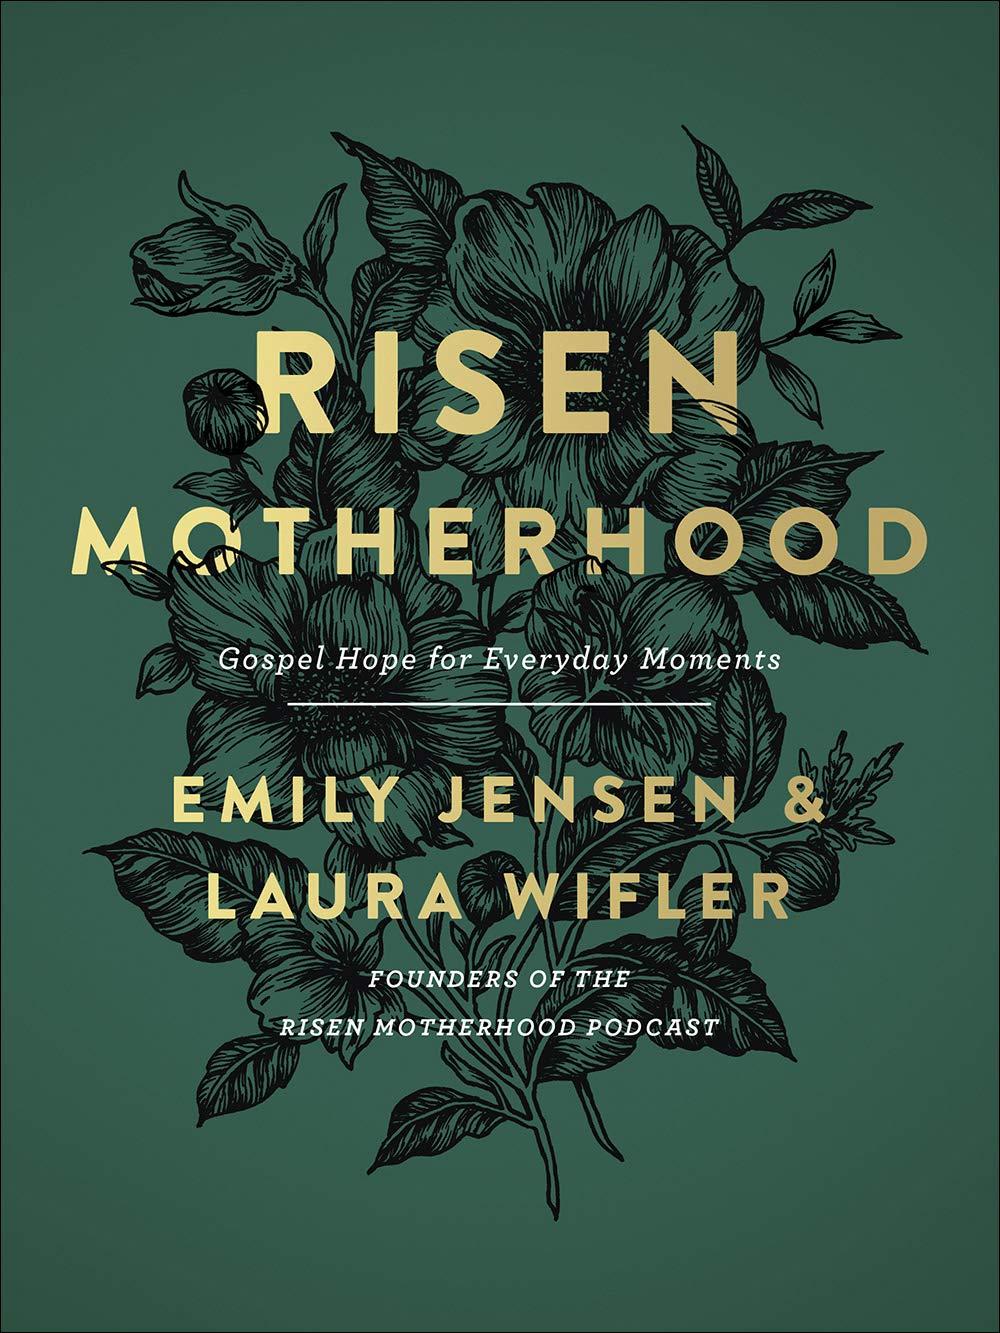 Risen Motherhood: Gospel Hope for Everyday Moments by Harvest House Publishers